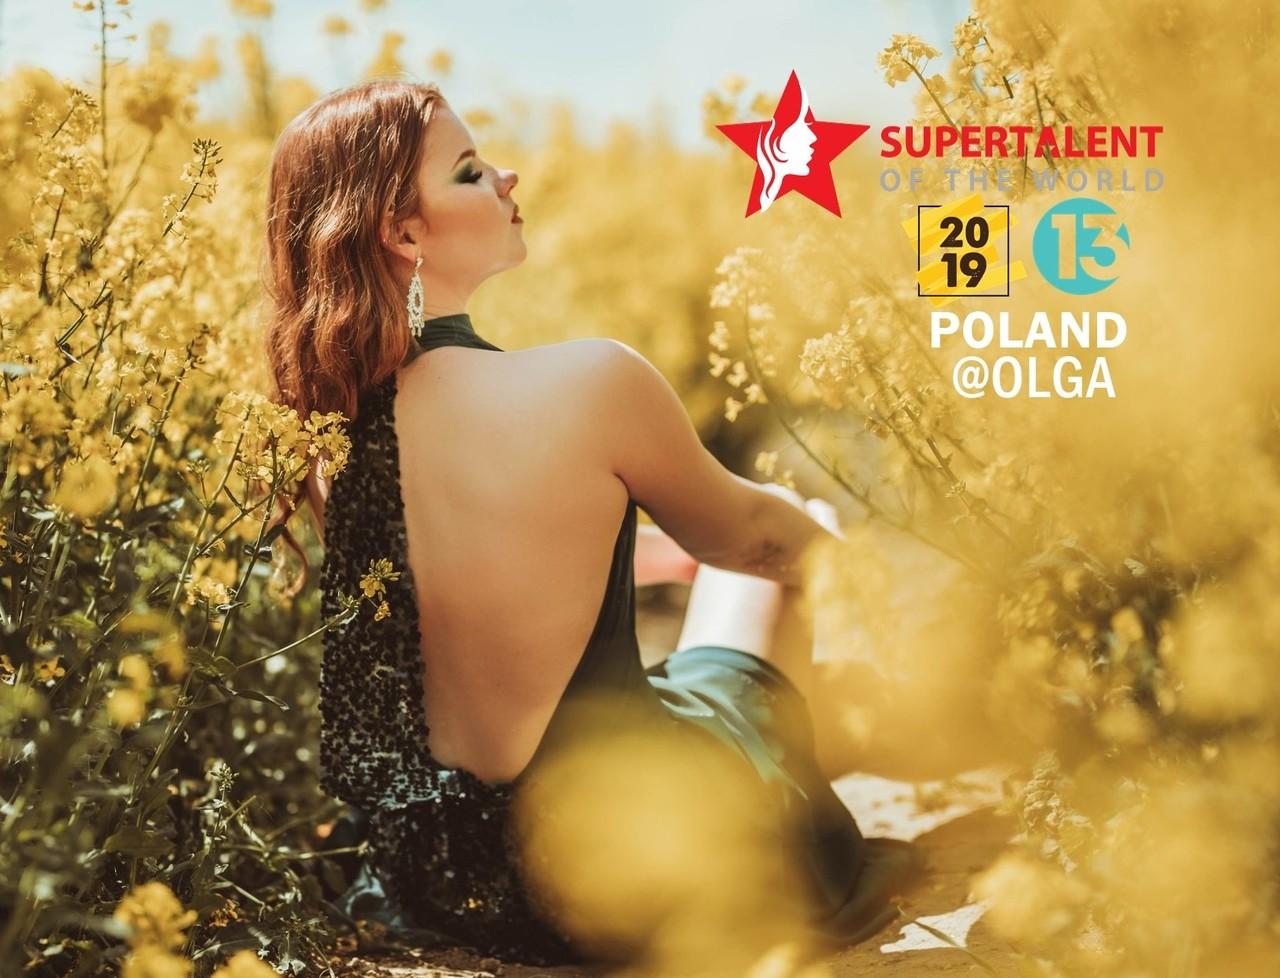 2019 Miss Supertalent POLAND Season 13<br>Olga, 174 cm, Age 22